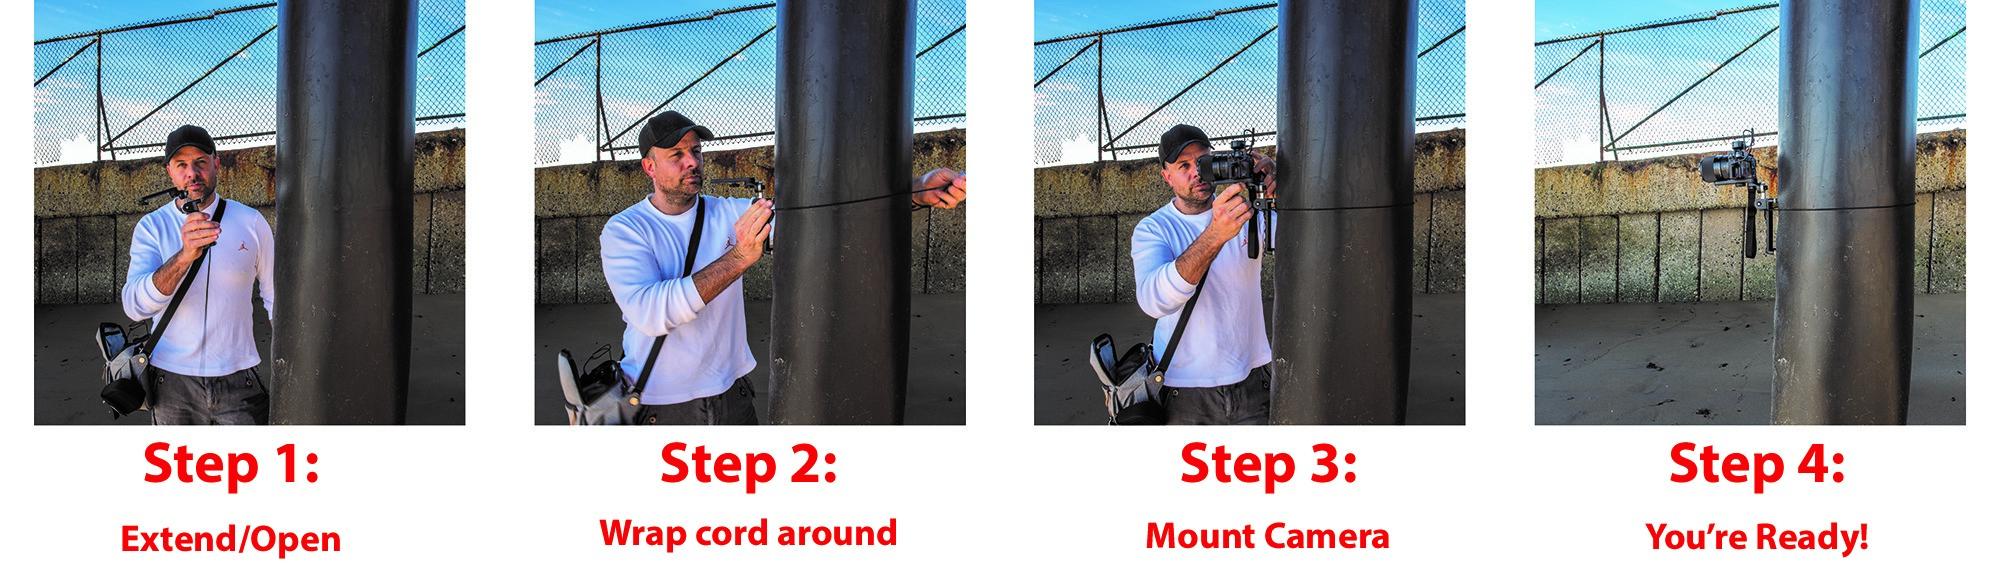 Landscape Photographers Checklist 002 image  image